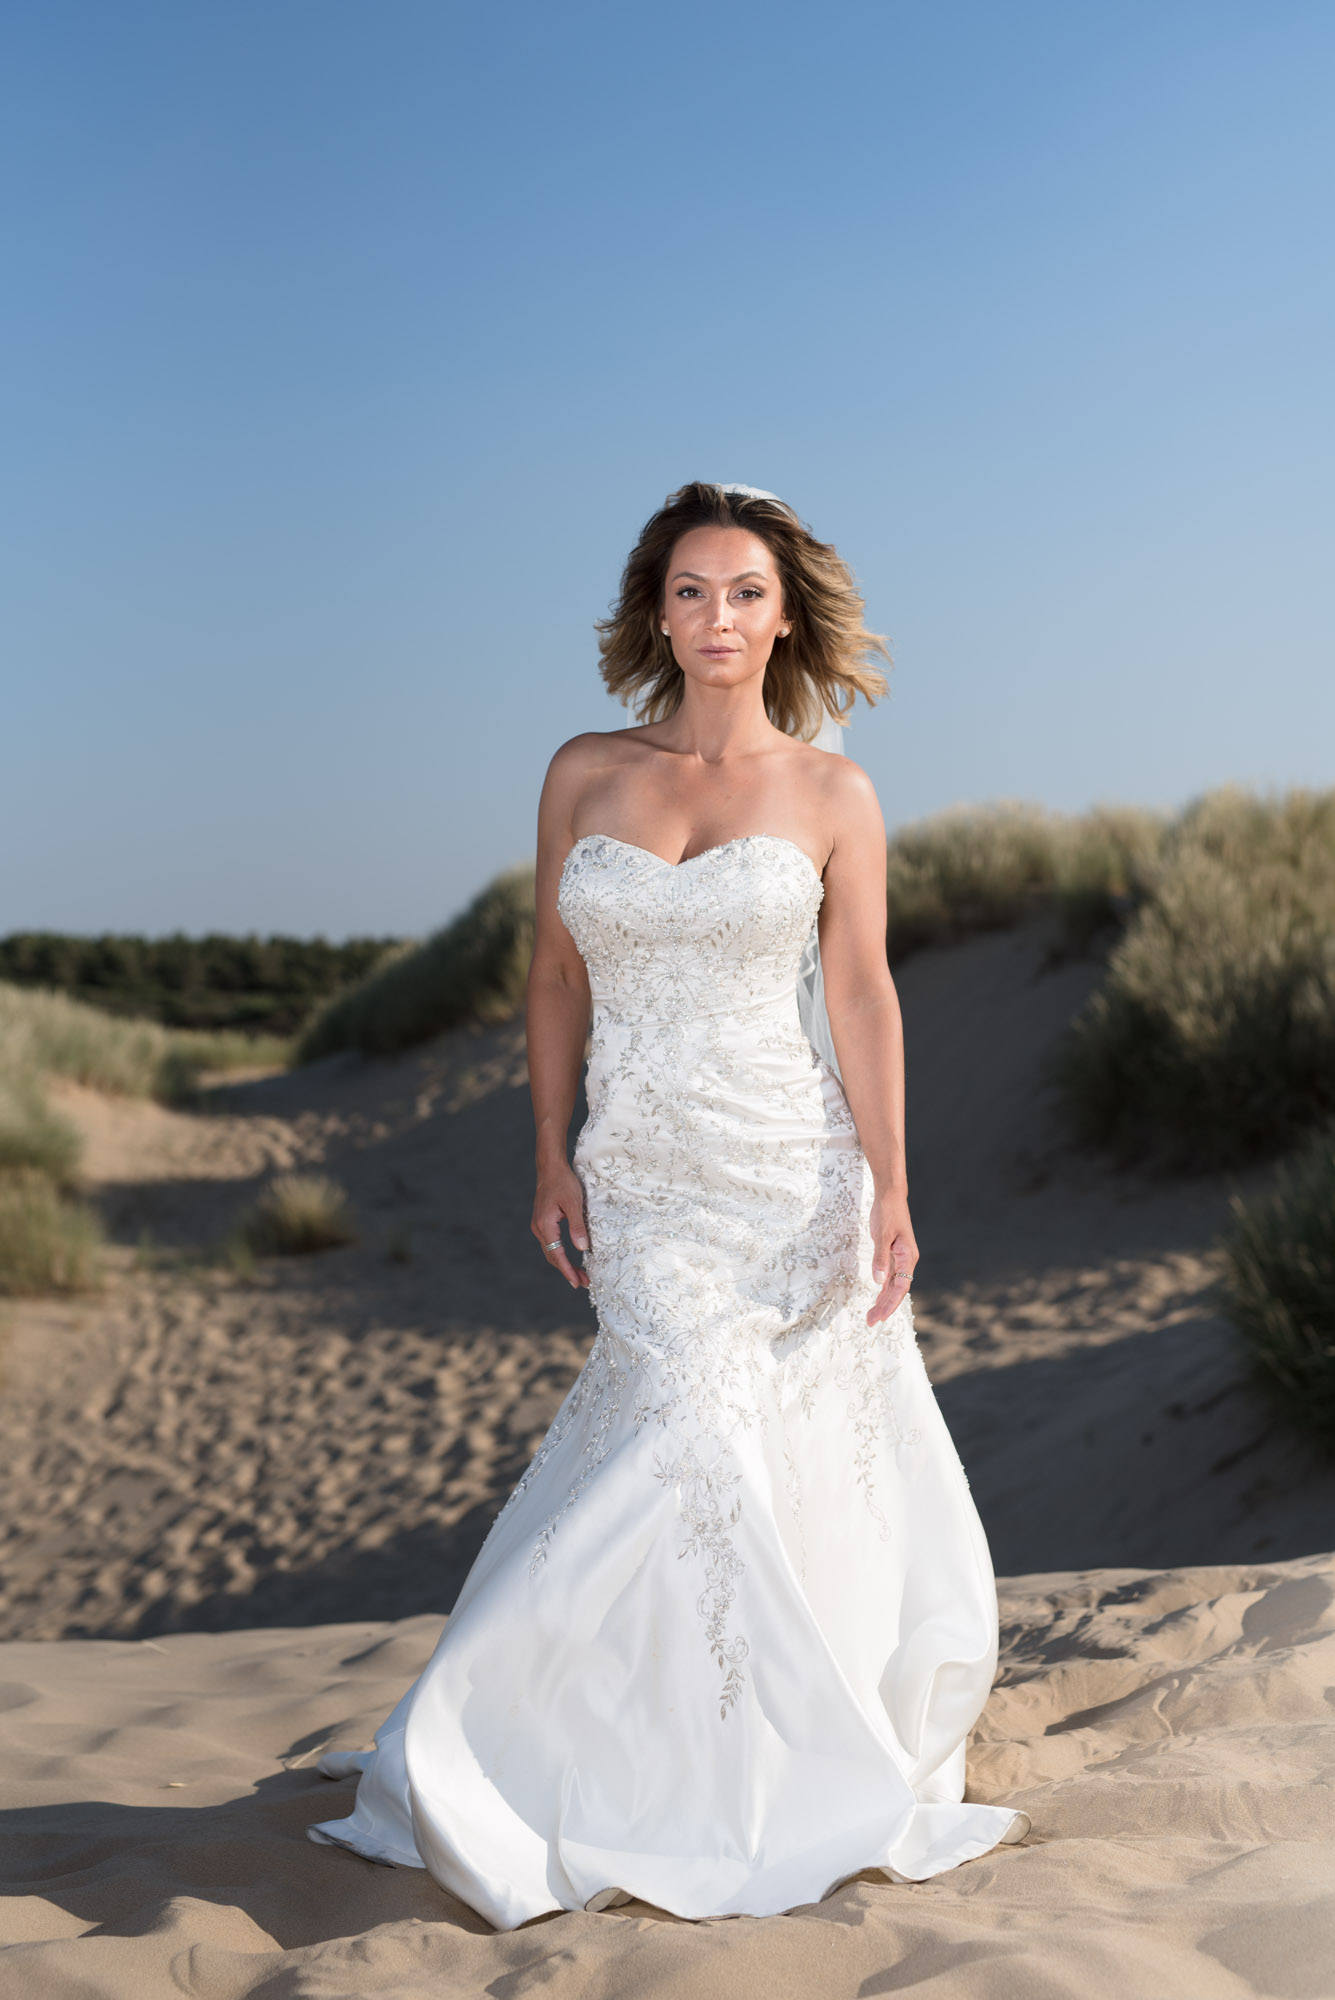 Brides dress on the beach